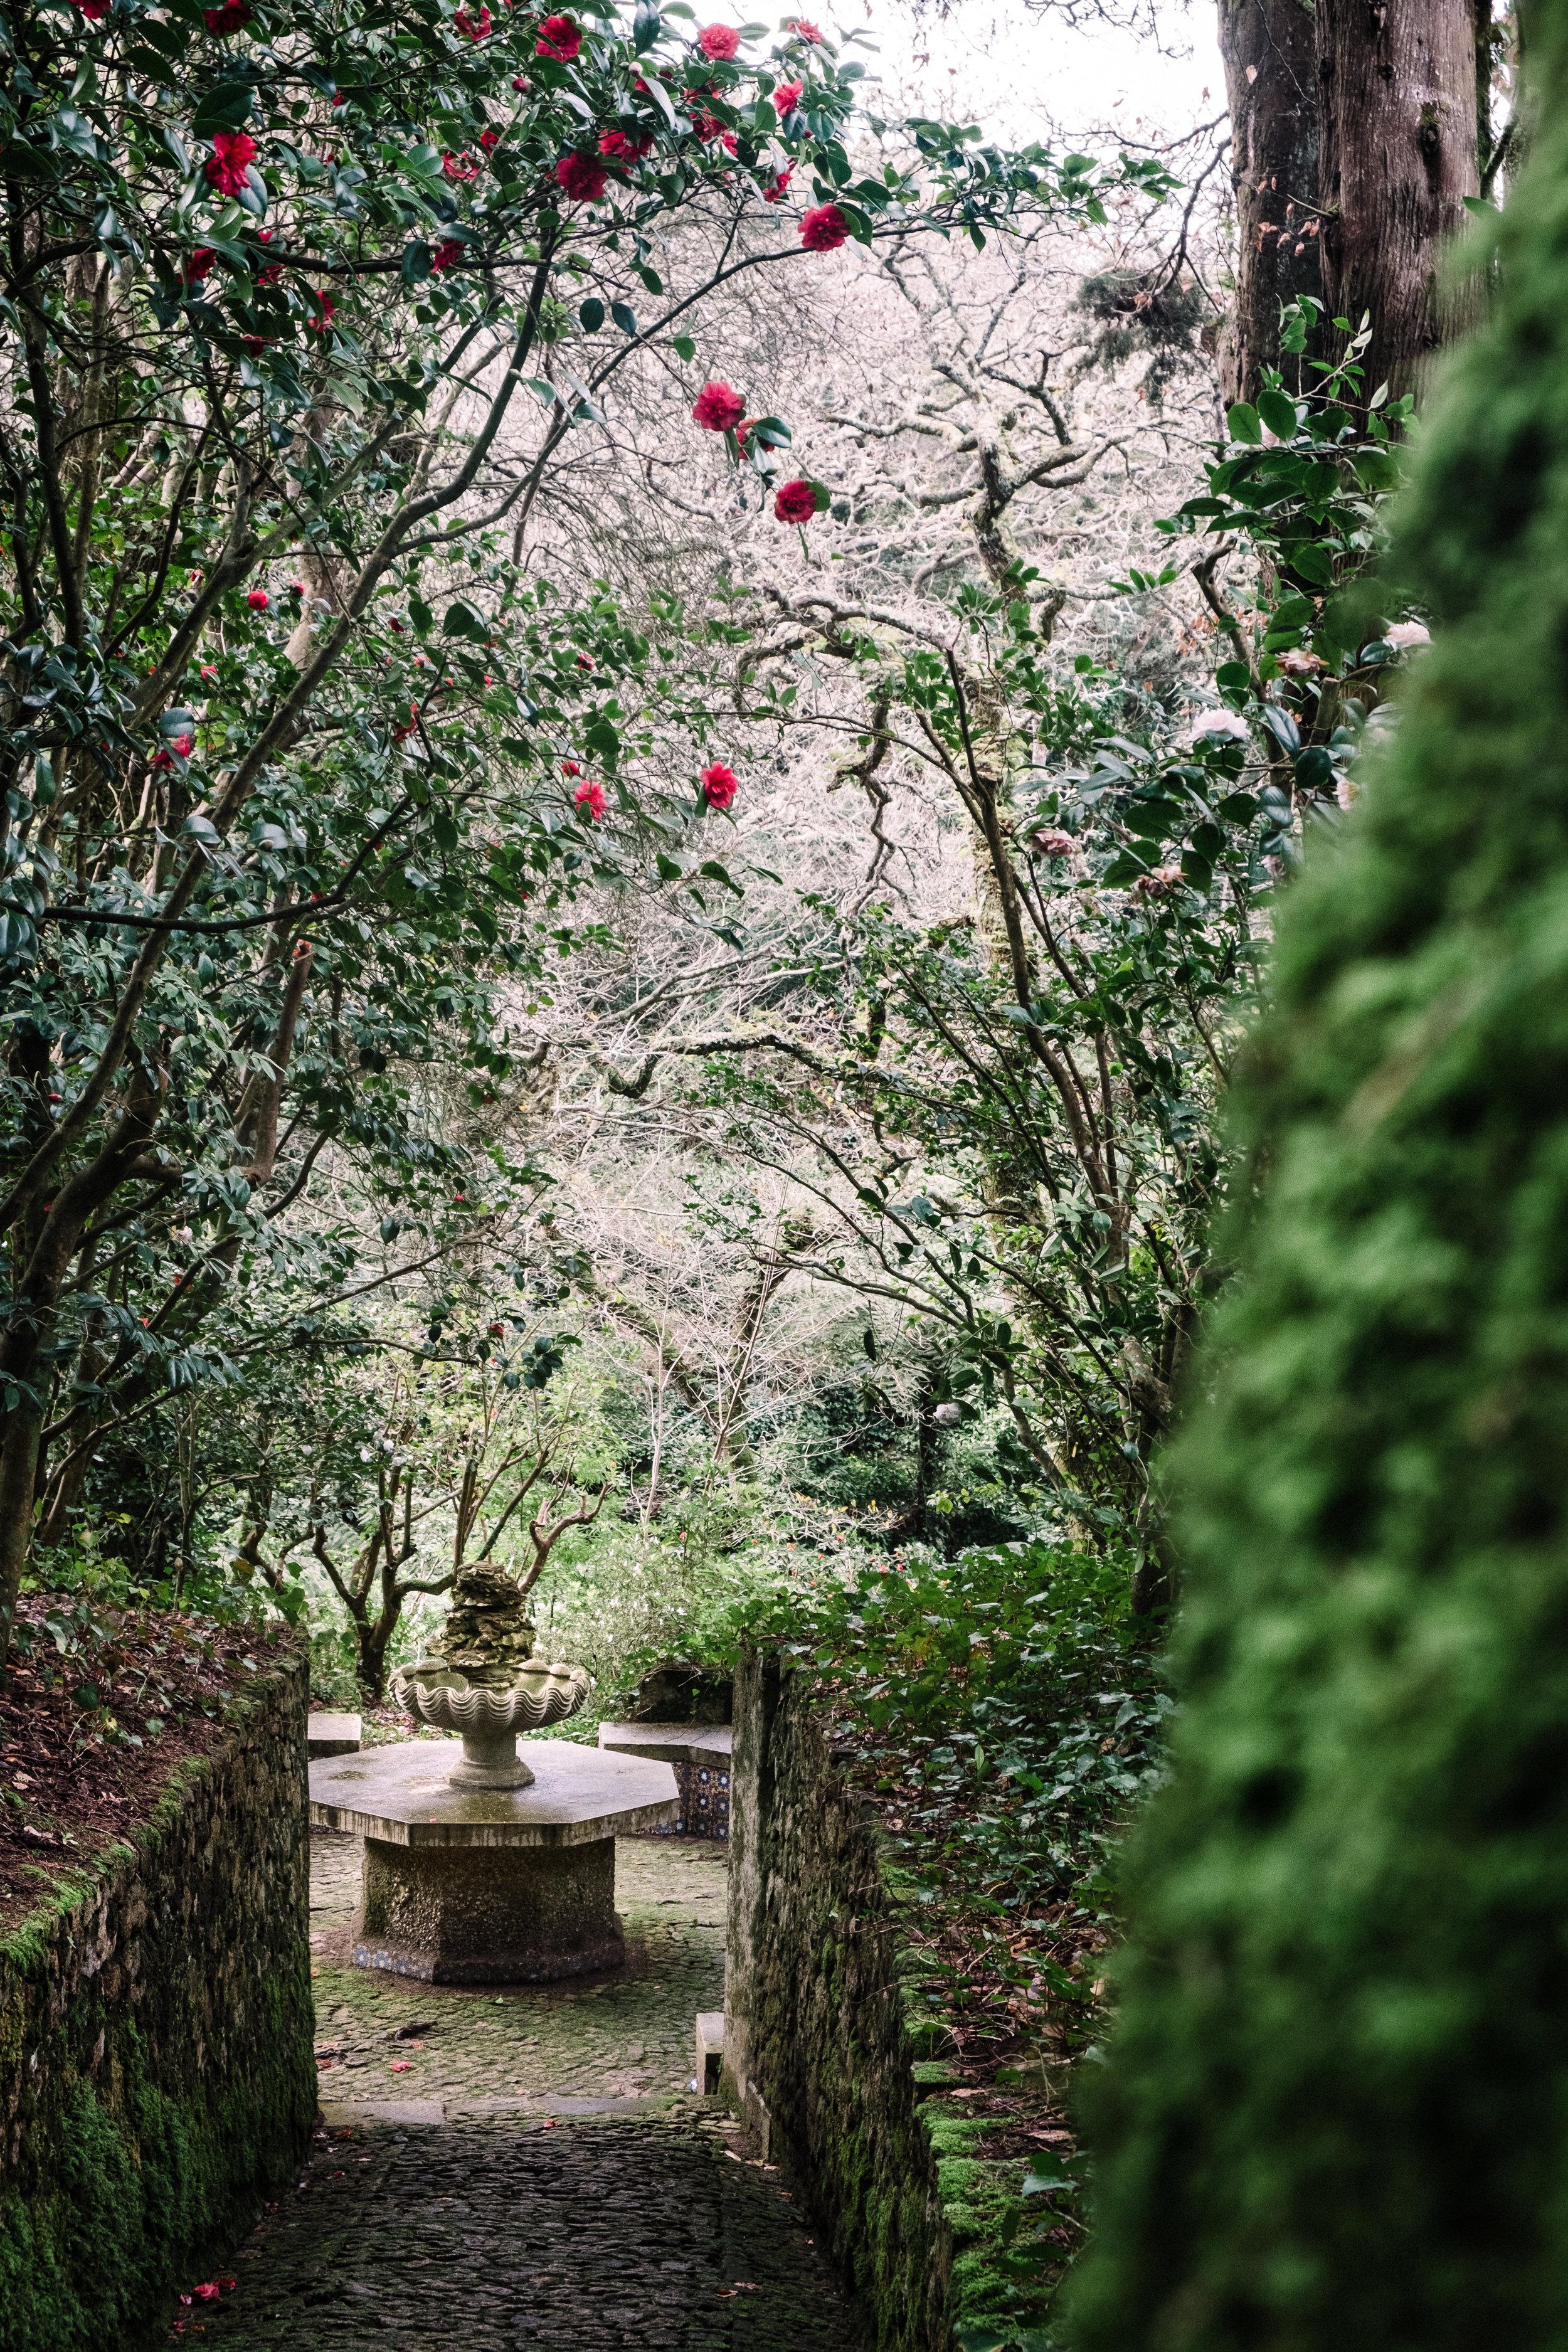 PenaPalace_Sintra_Portugal_JuliaMattis_Photo08.jpg